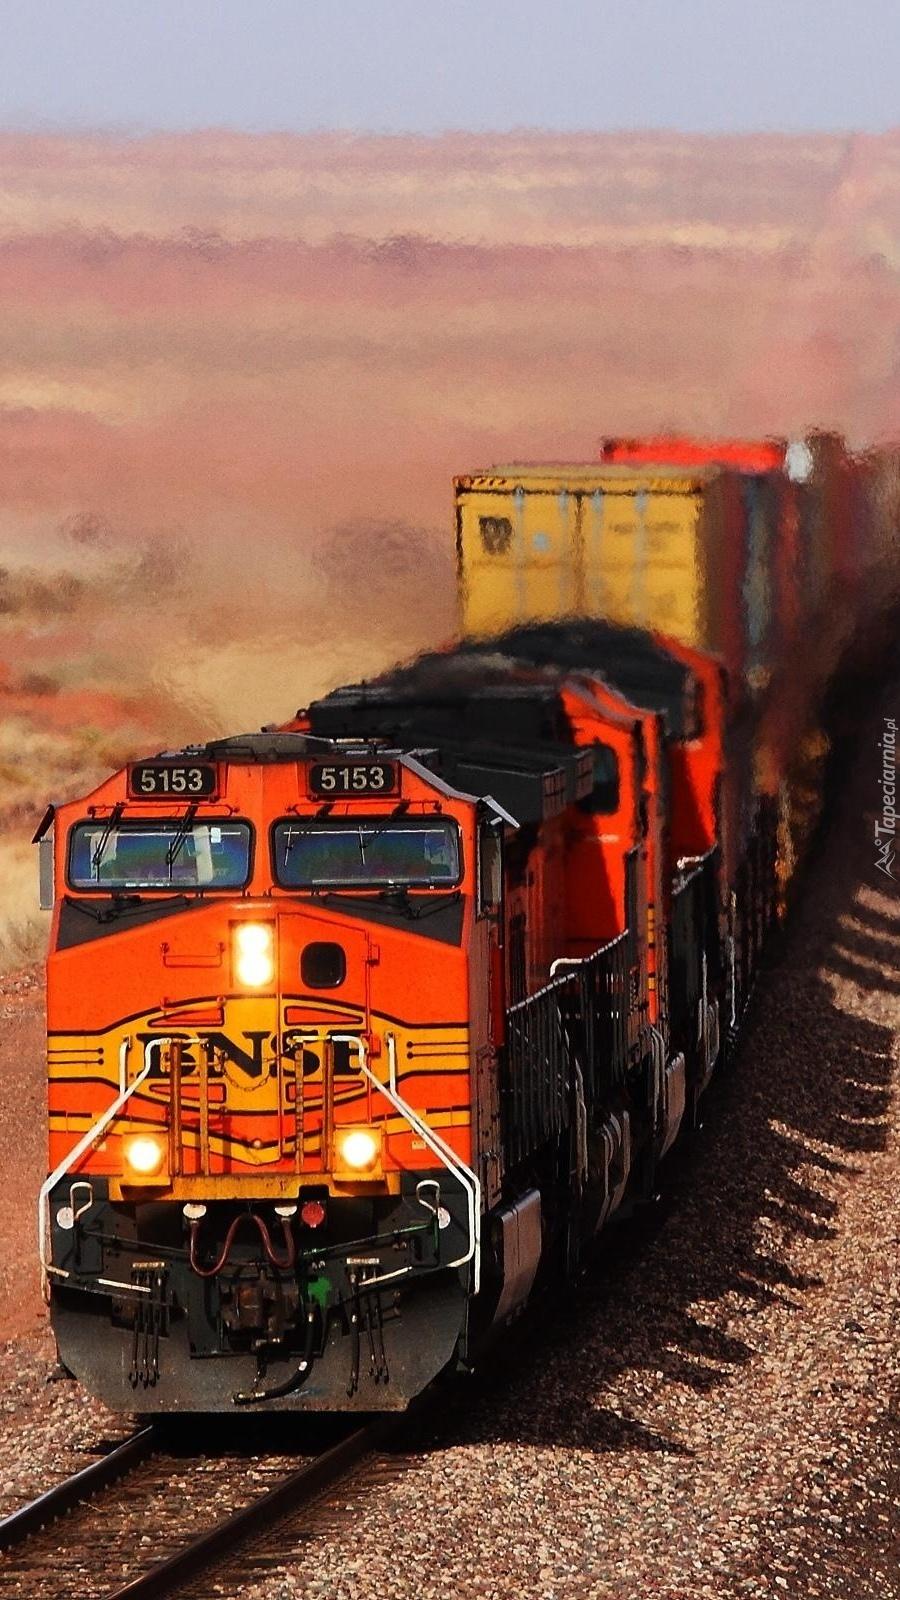 Uwaga nadjeżdża pociąg